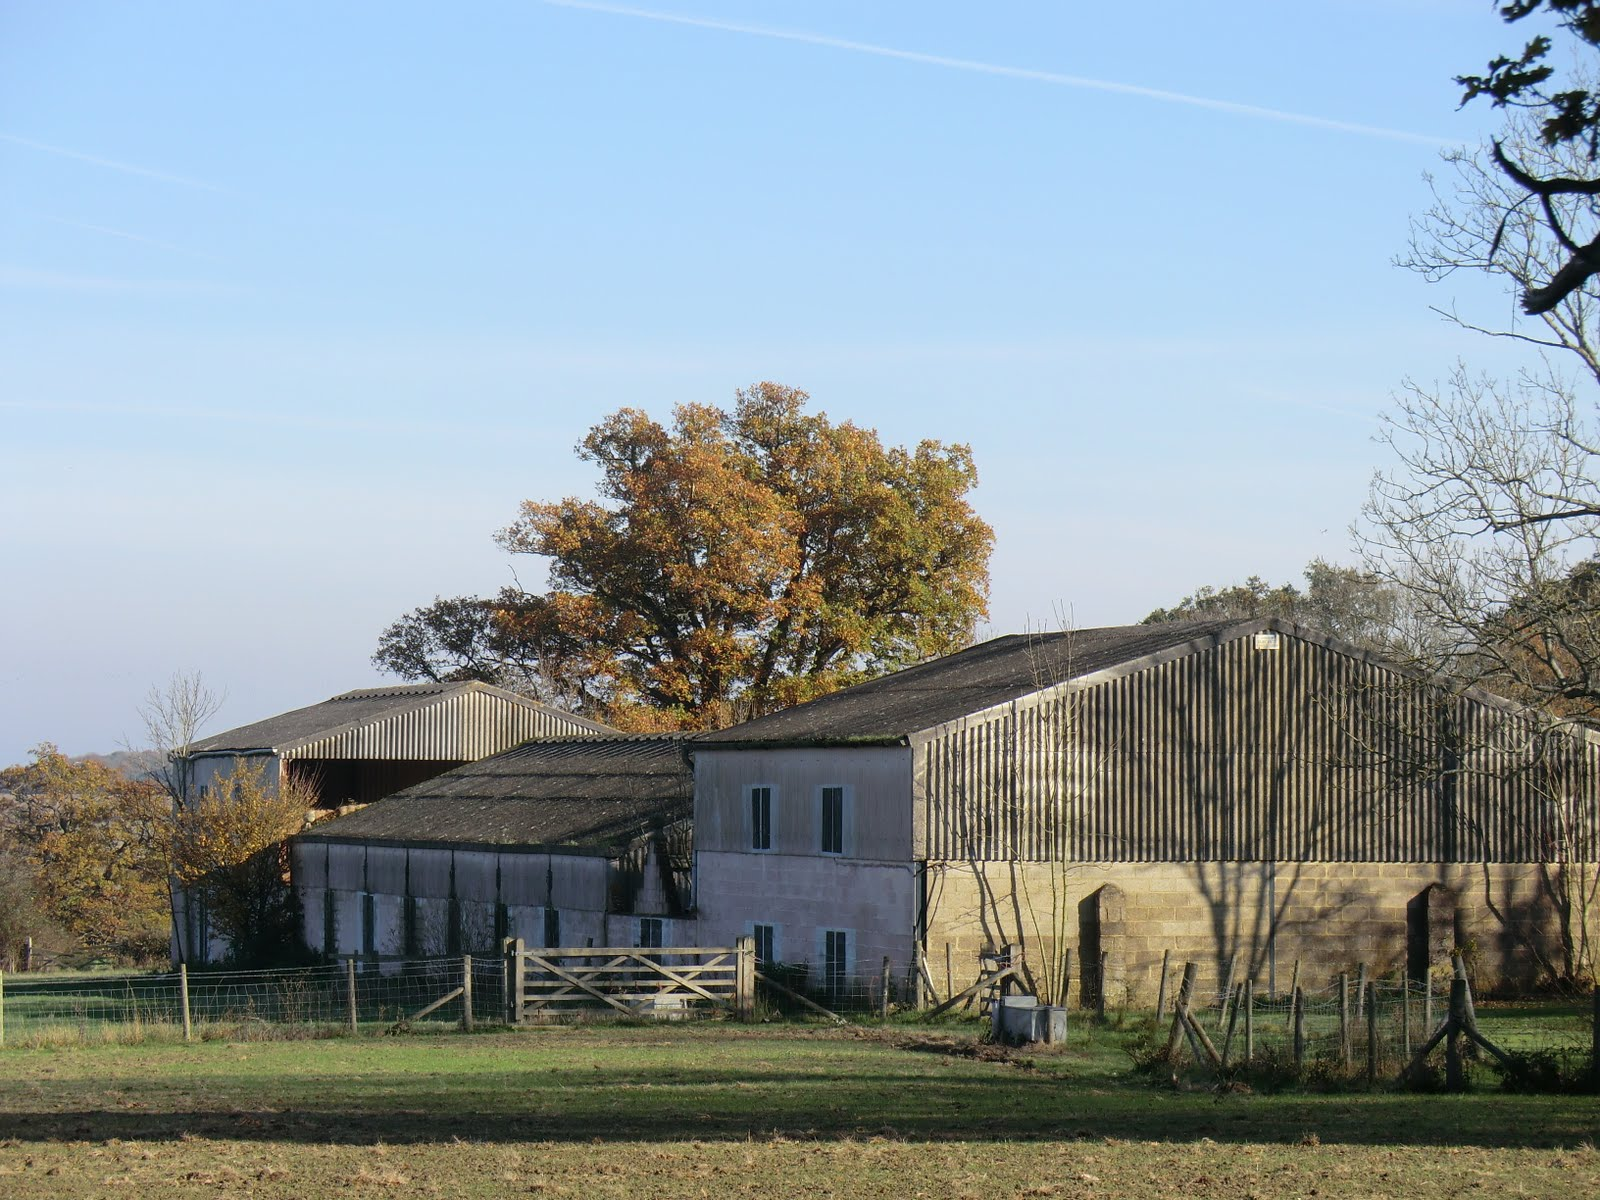 CIMG0284 Old farm buildings at Wat Stock (trompe-l'oeil)